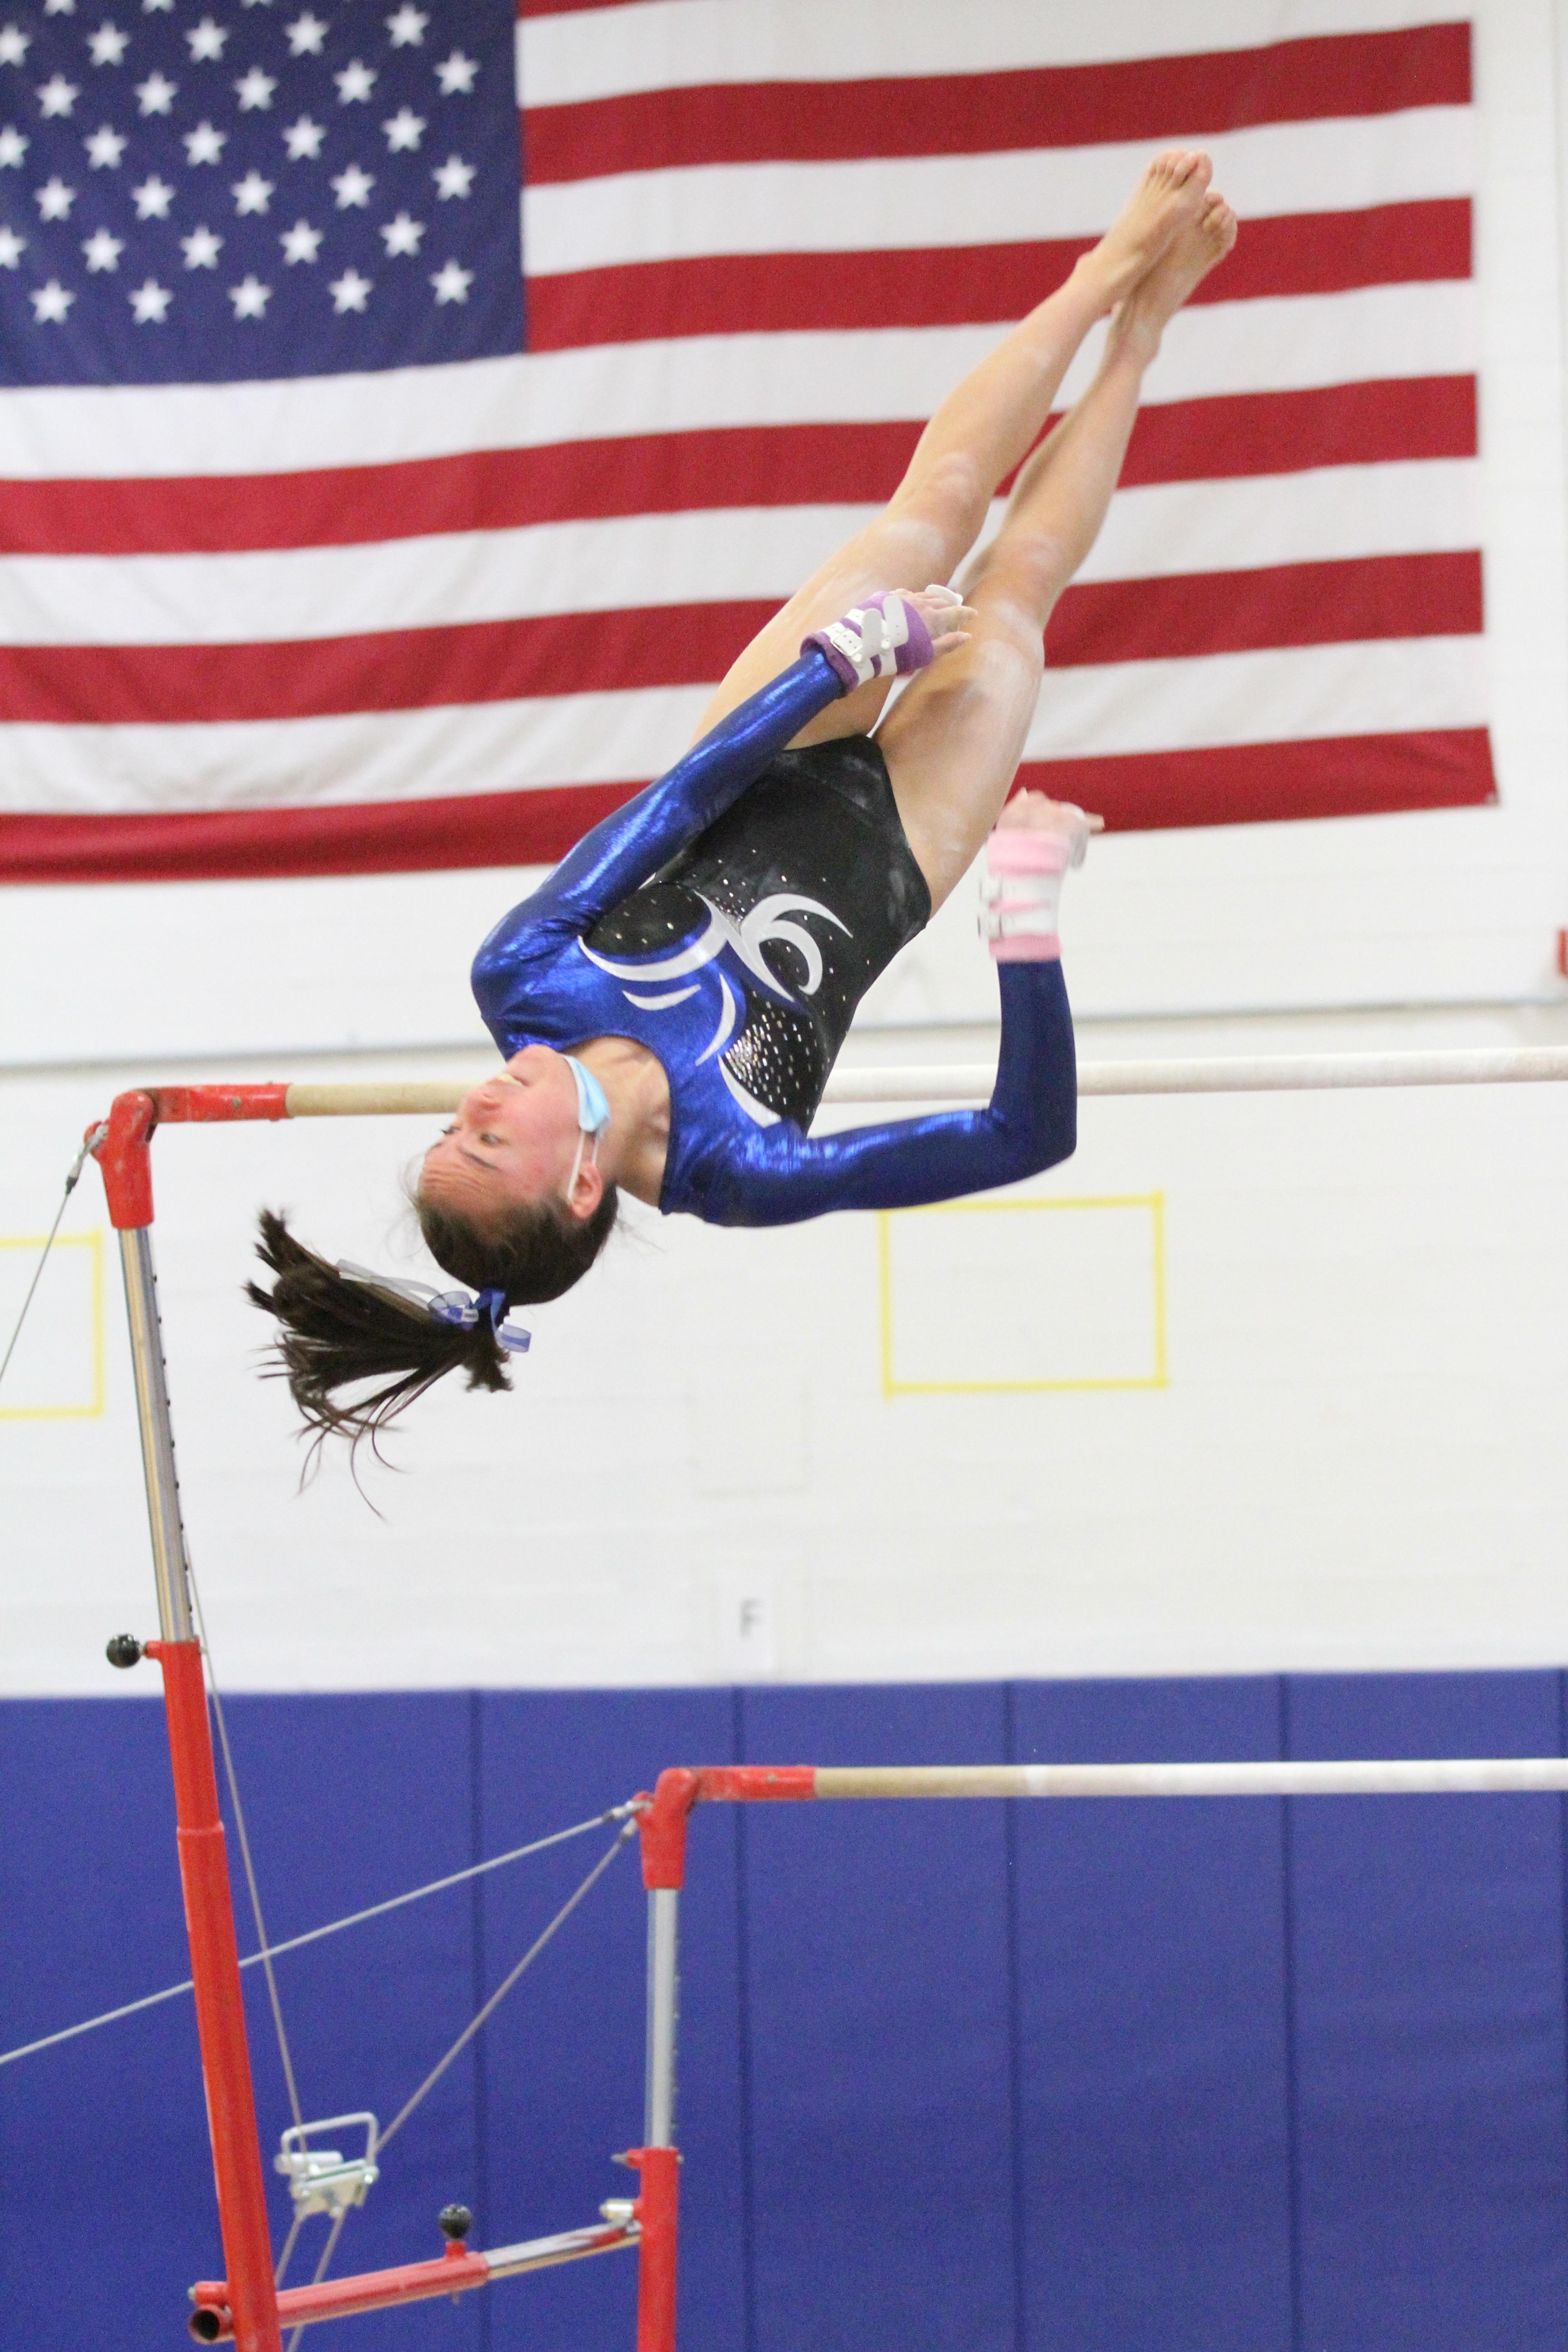 Allie Fernandez Allstate Athlete of the Week